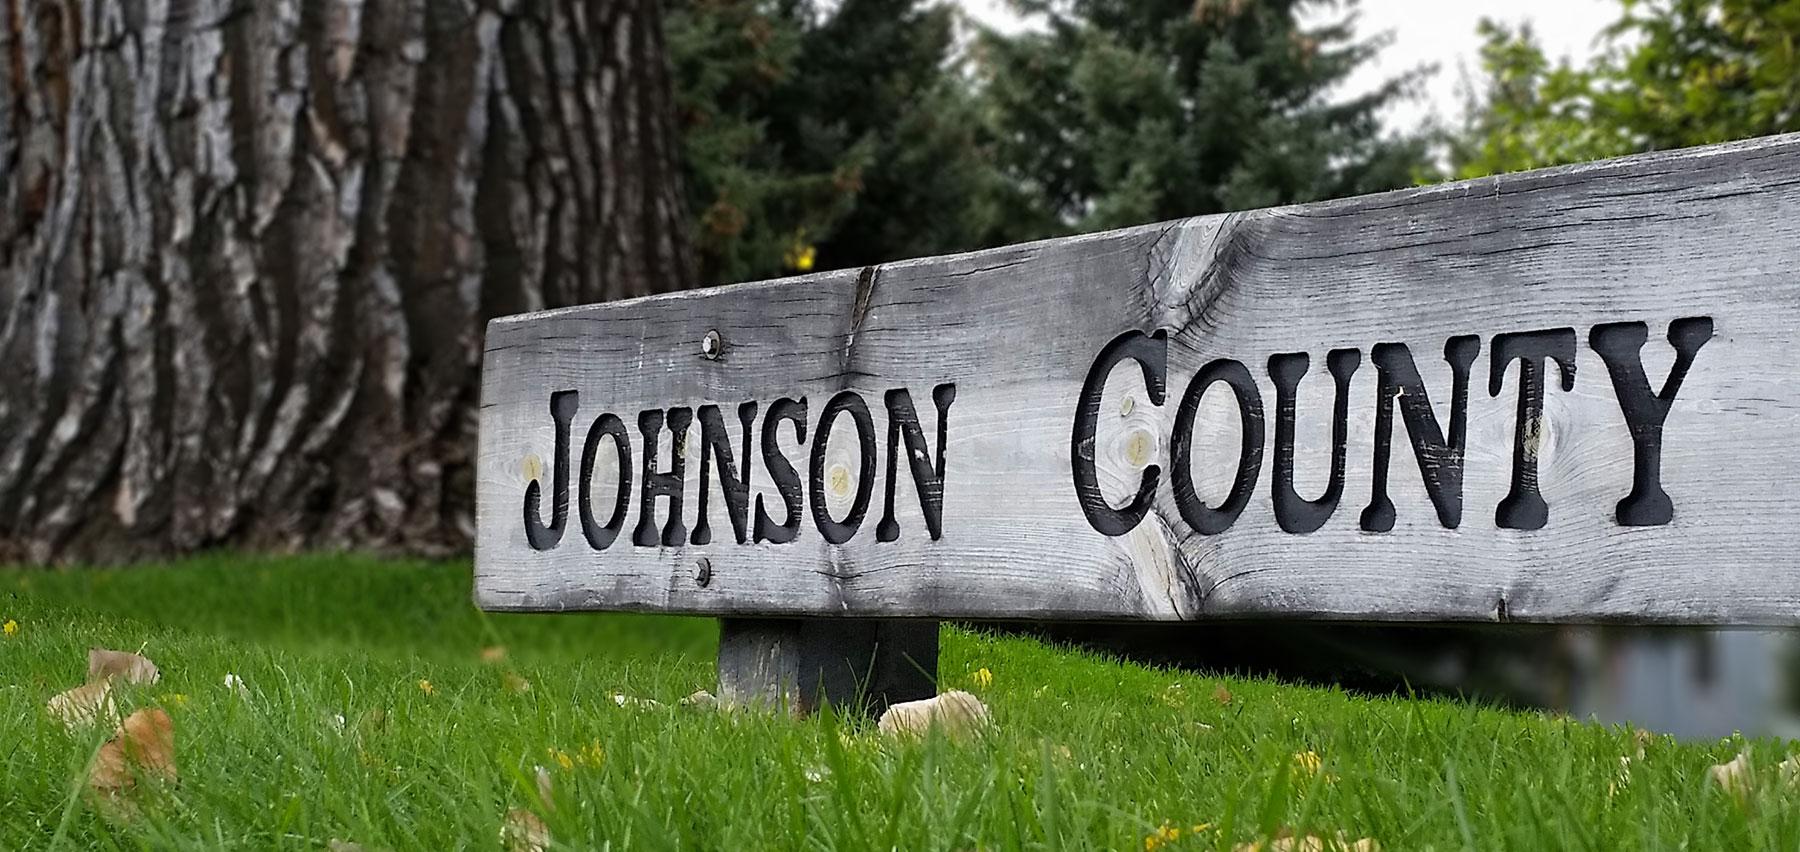 Johnson County, Wy | Johnson County, Wy